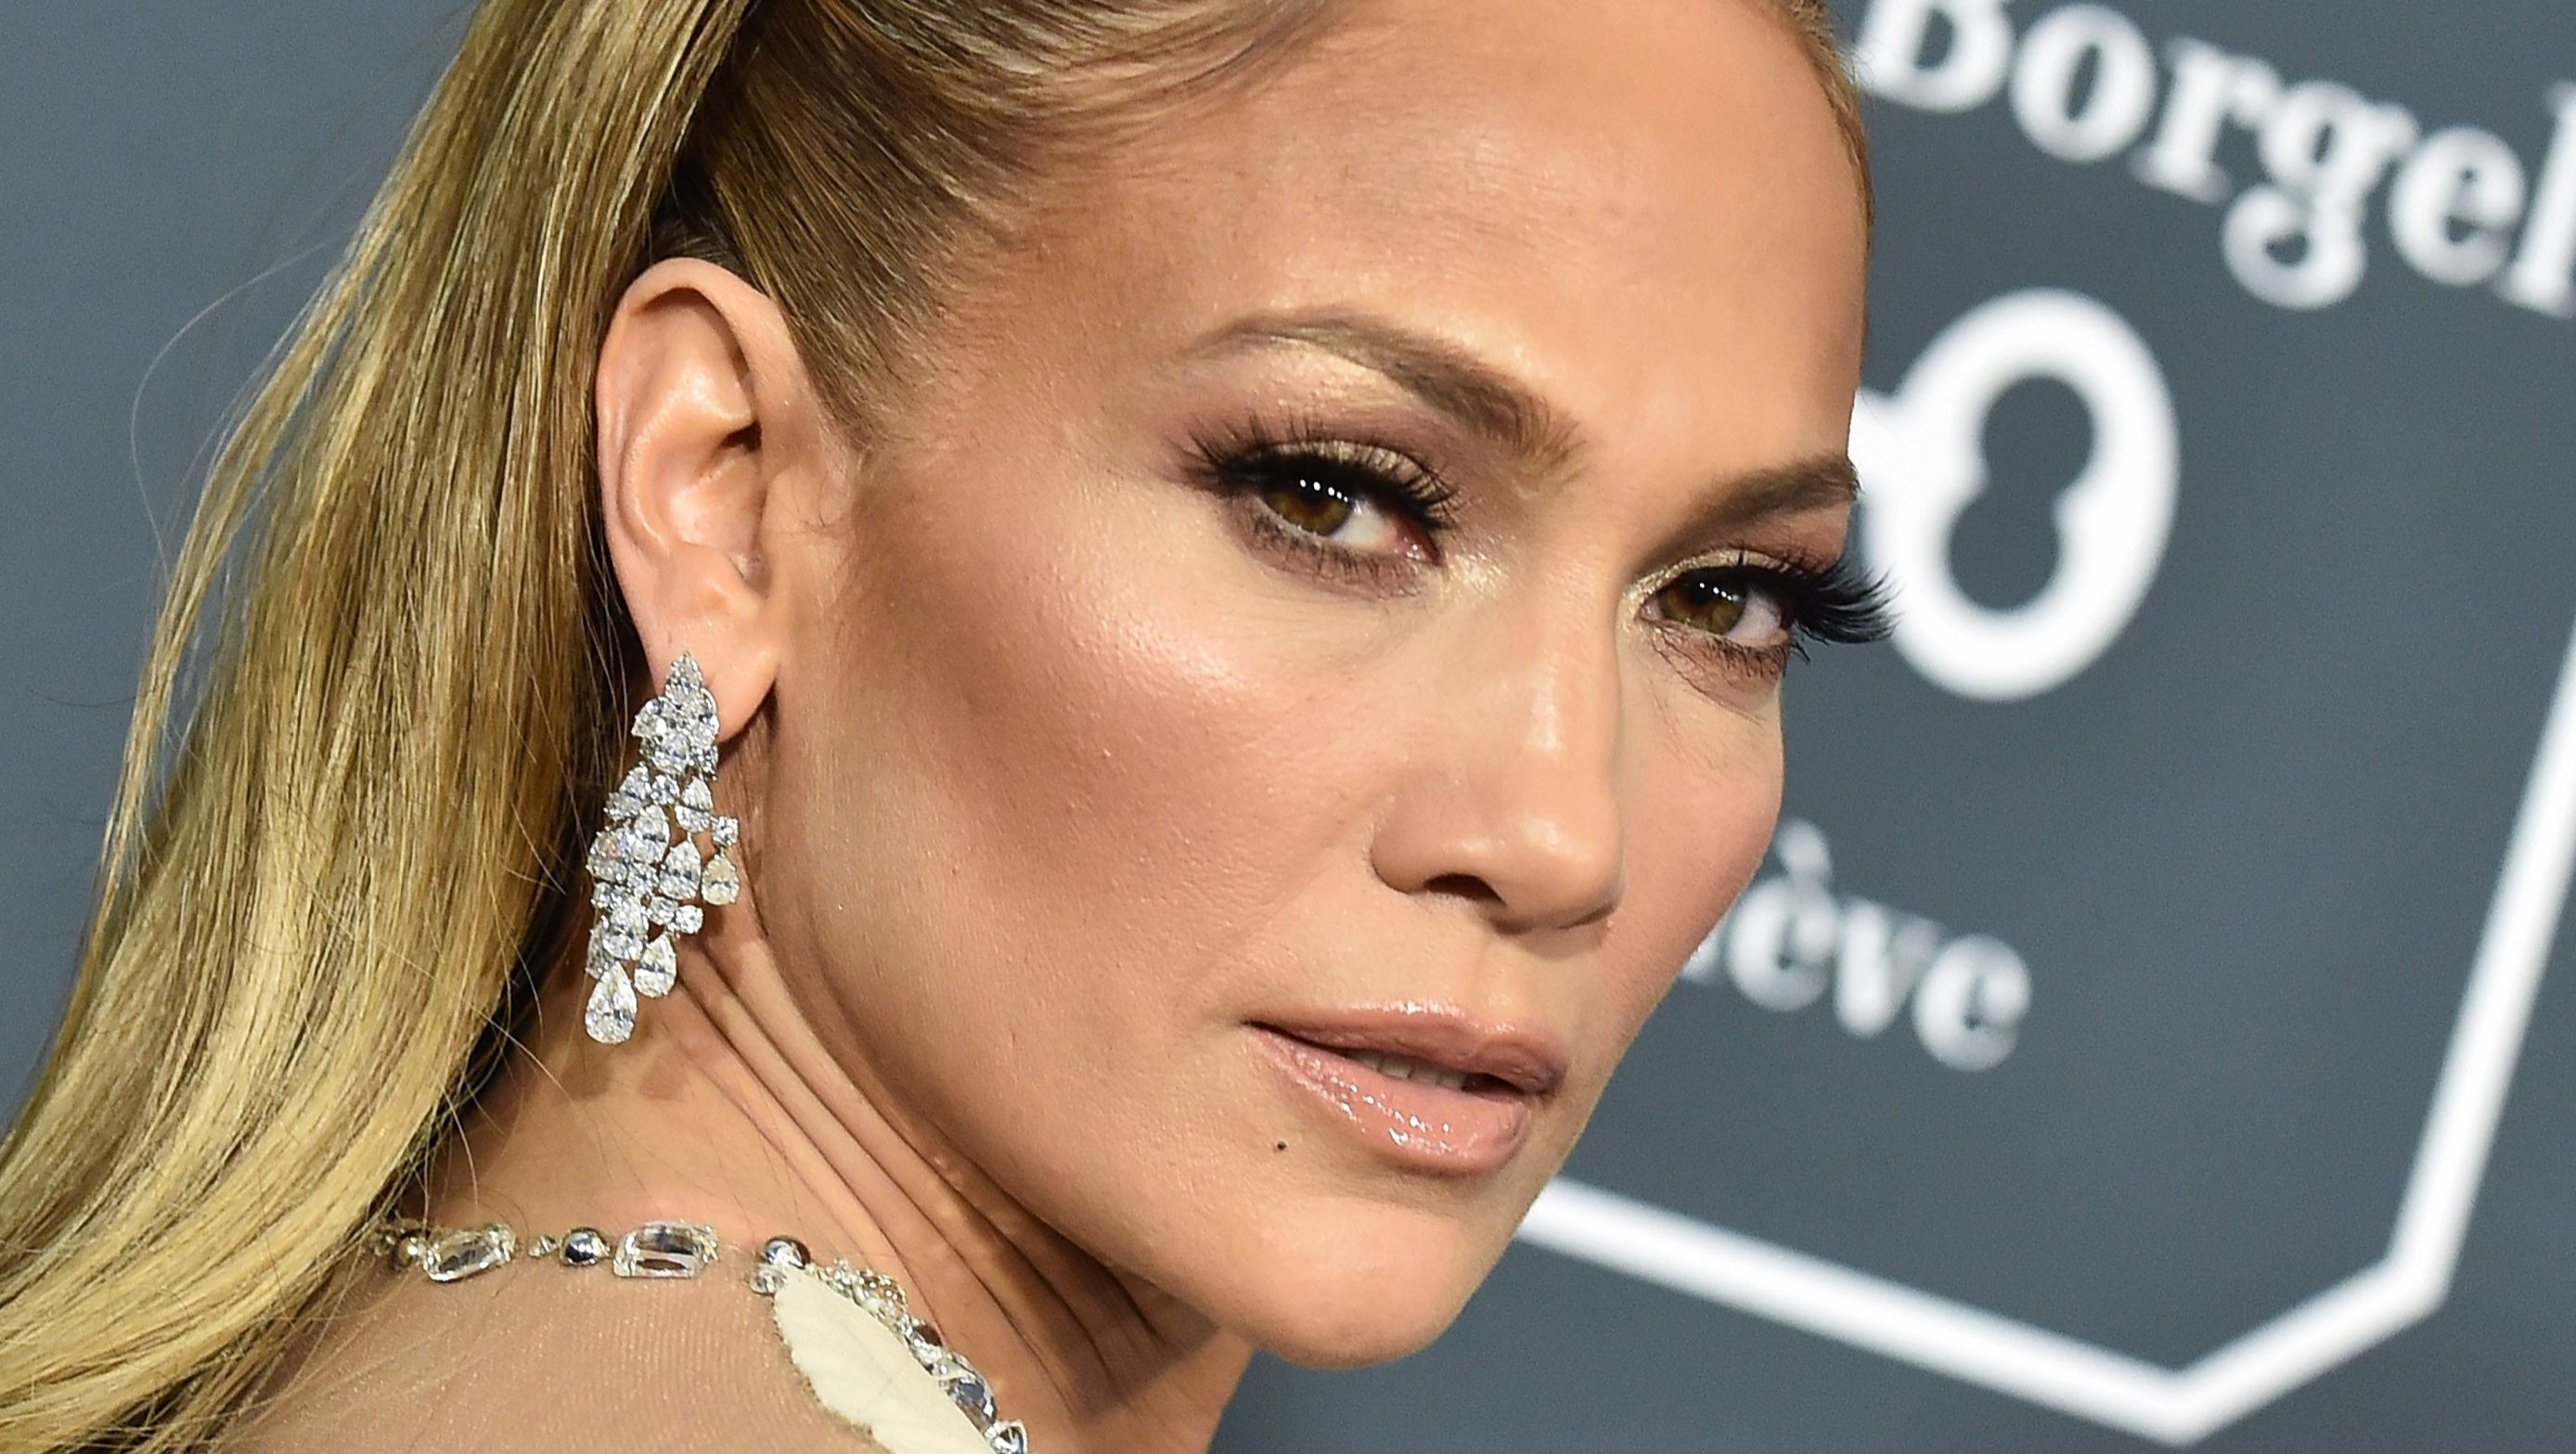 Jennifer Lopez looks over her shoulder with dangling diamond earrings.